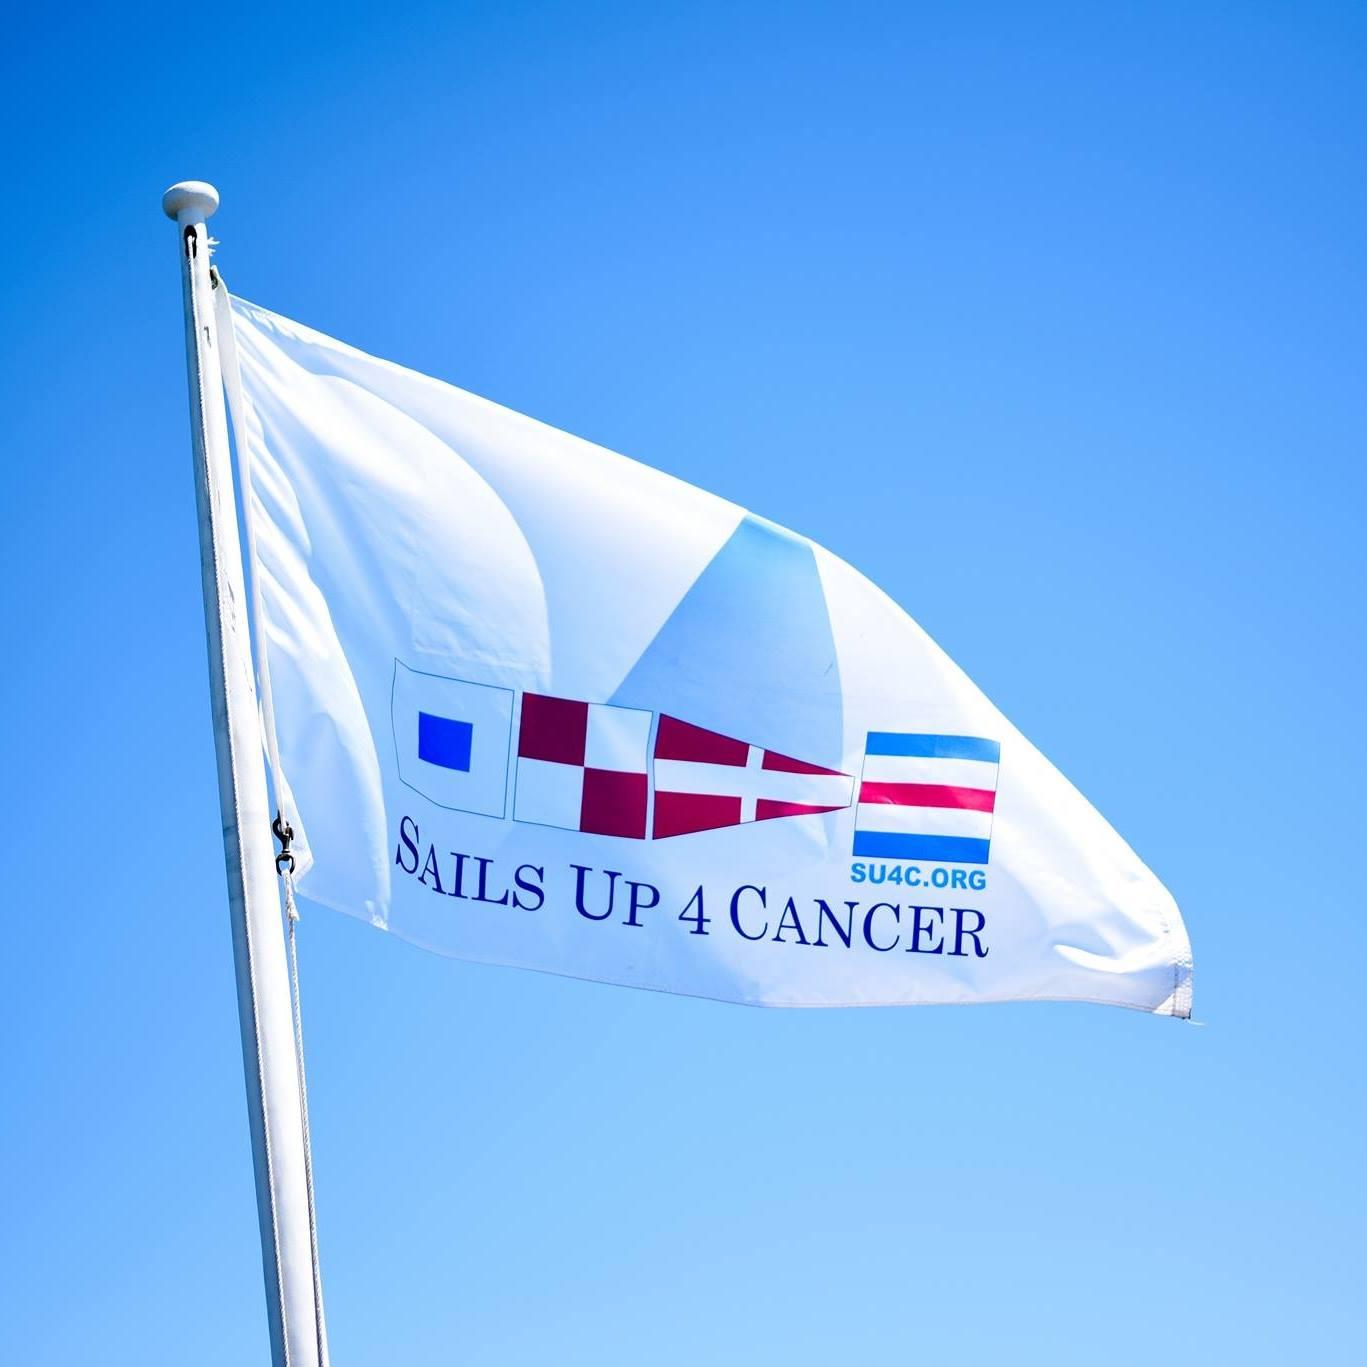 Sails Up 4 Cancer Regatta Weekend is June 18 & 19